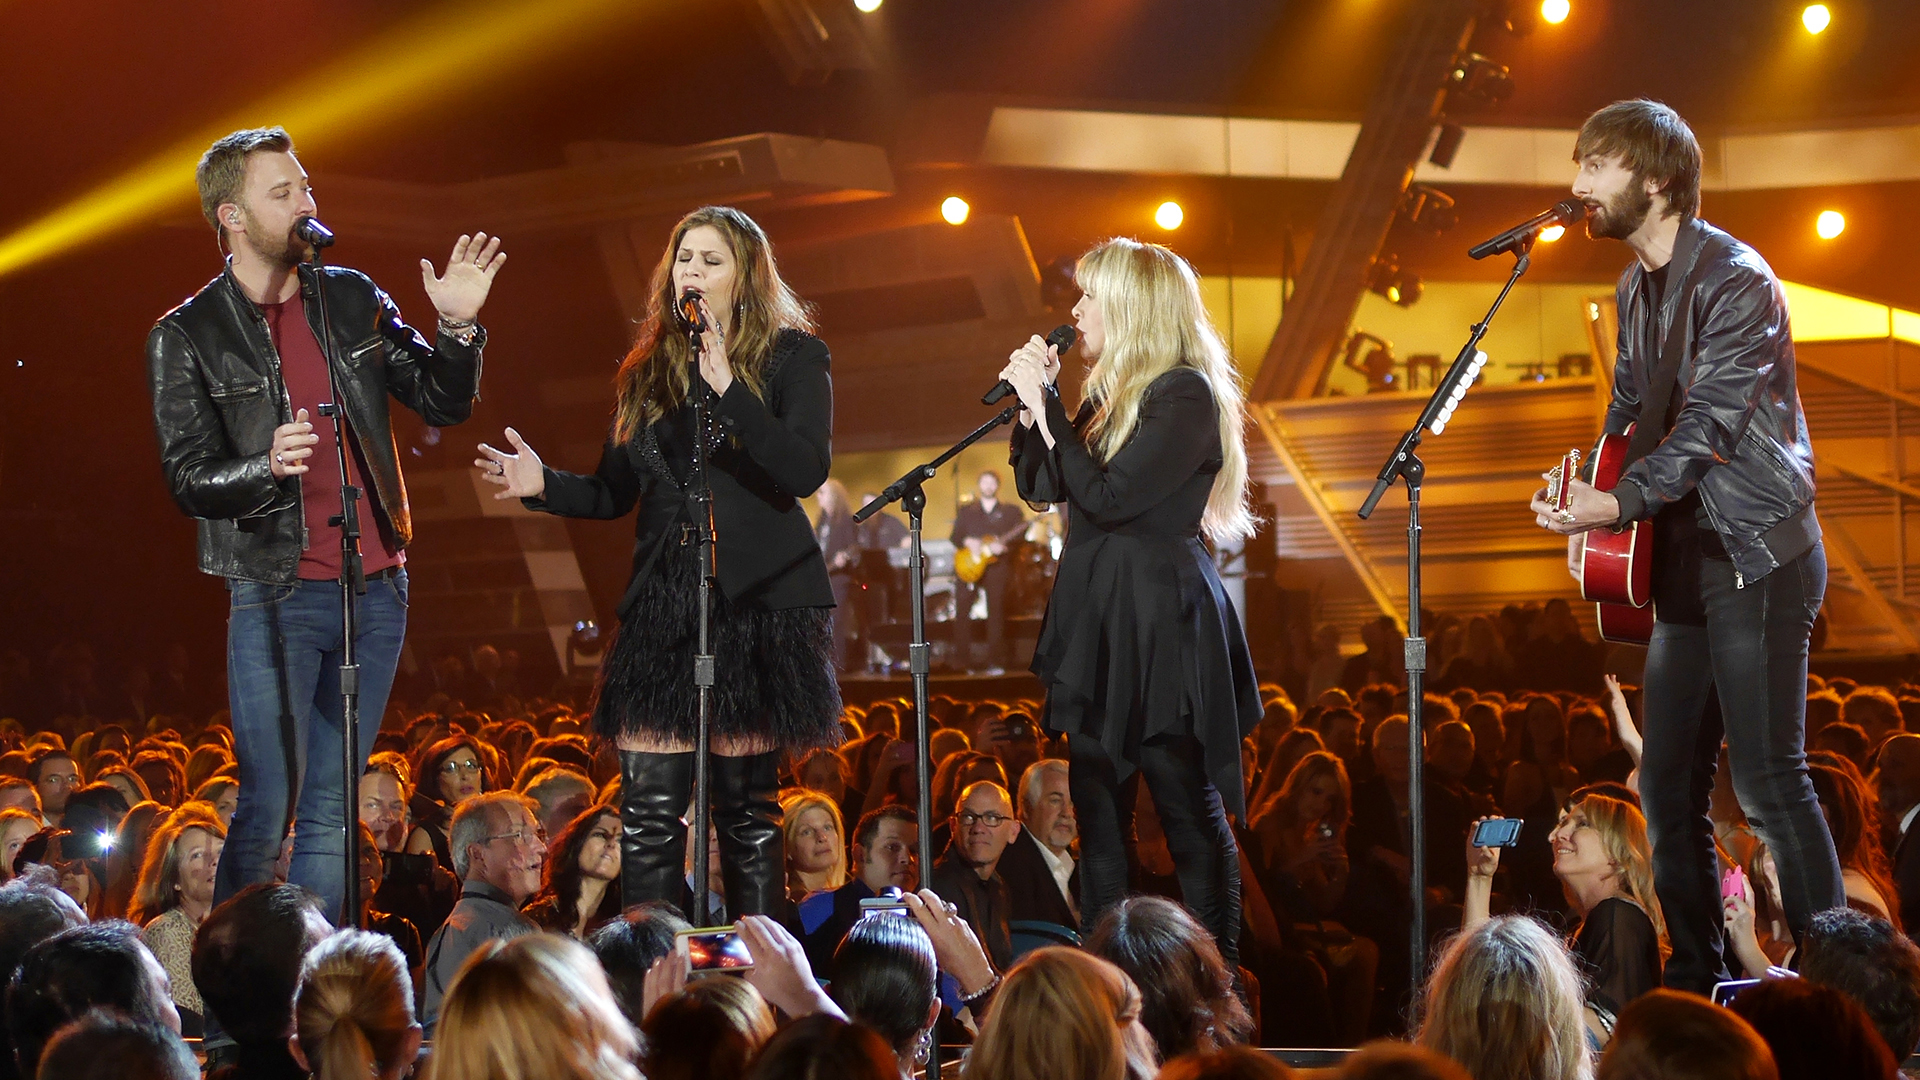 5. Lady Antebellum and Stevie Nicks perform